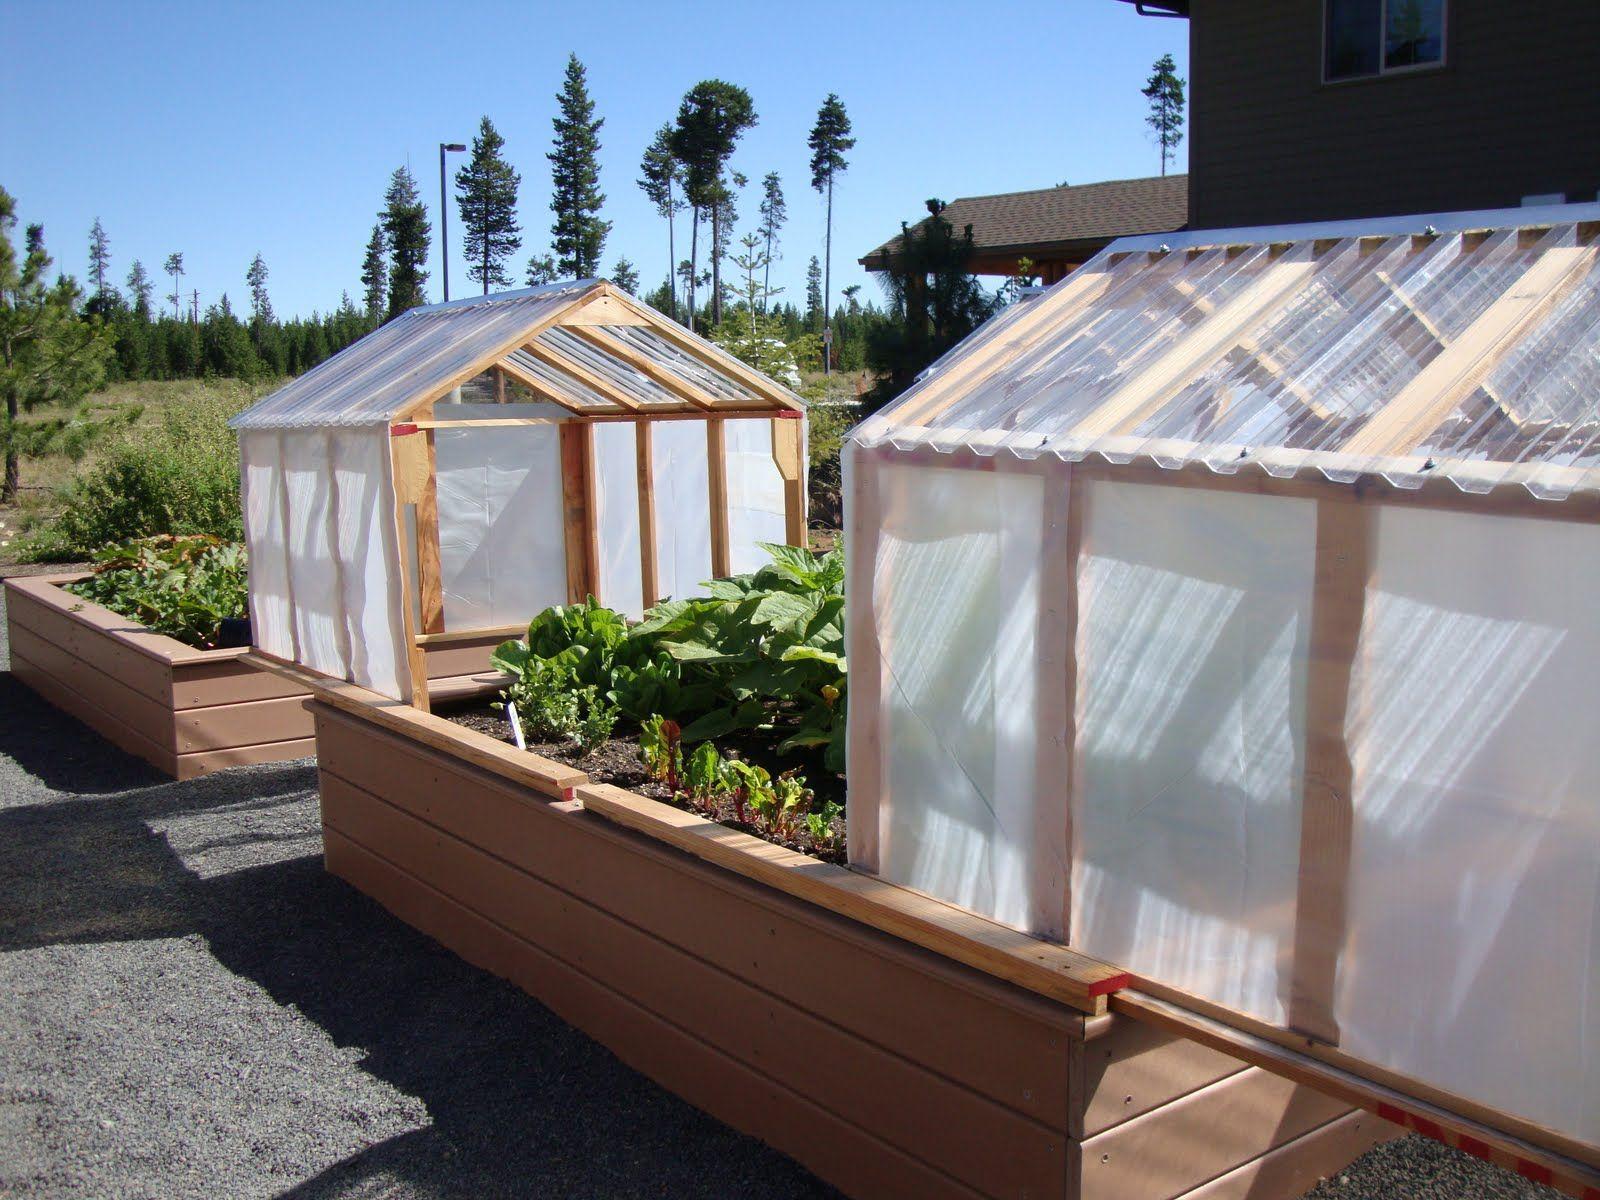 Minigreenhouses or raised beds? Both! Garden beds, Mini